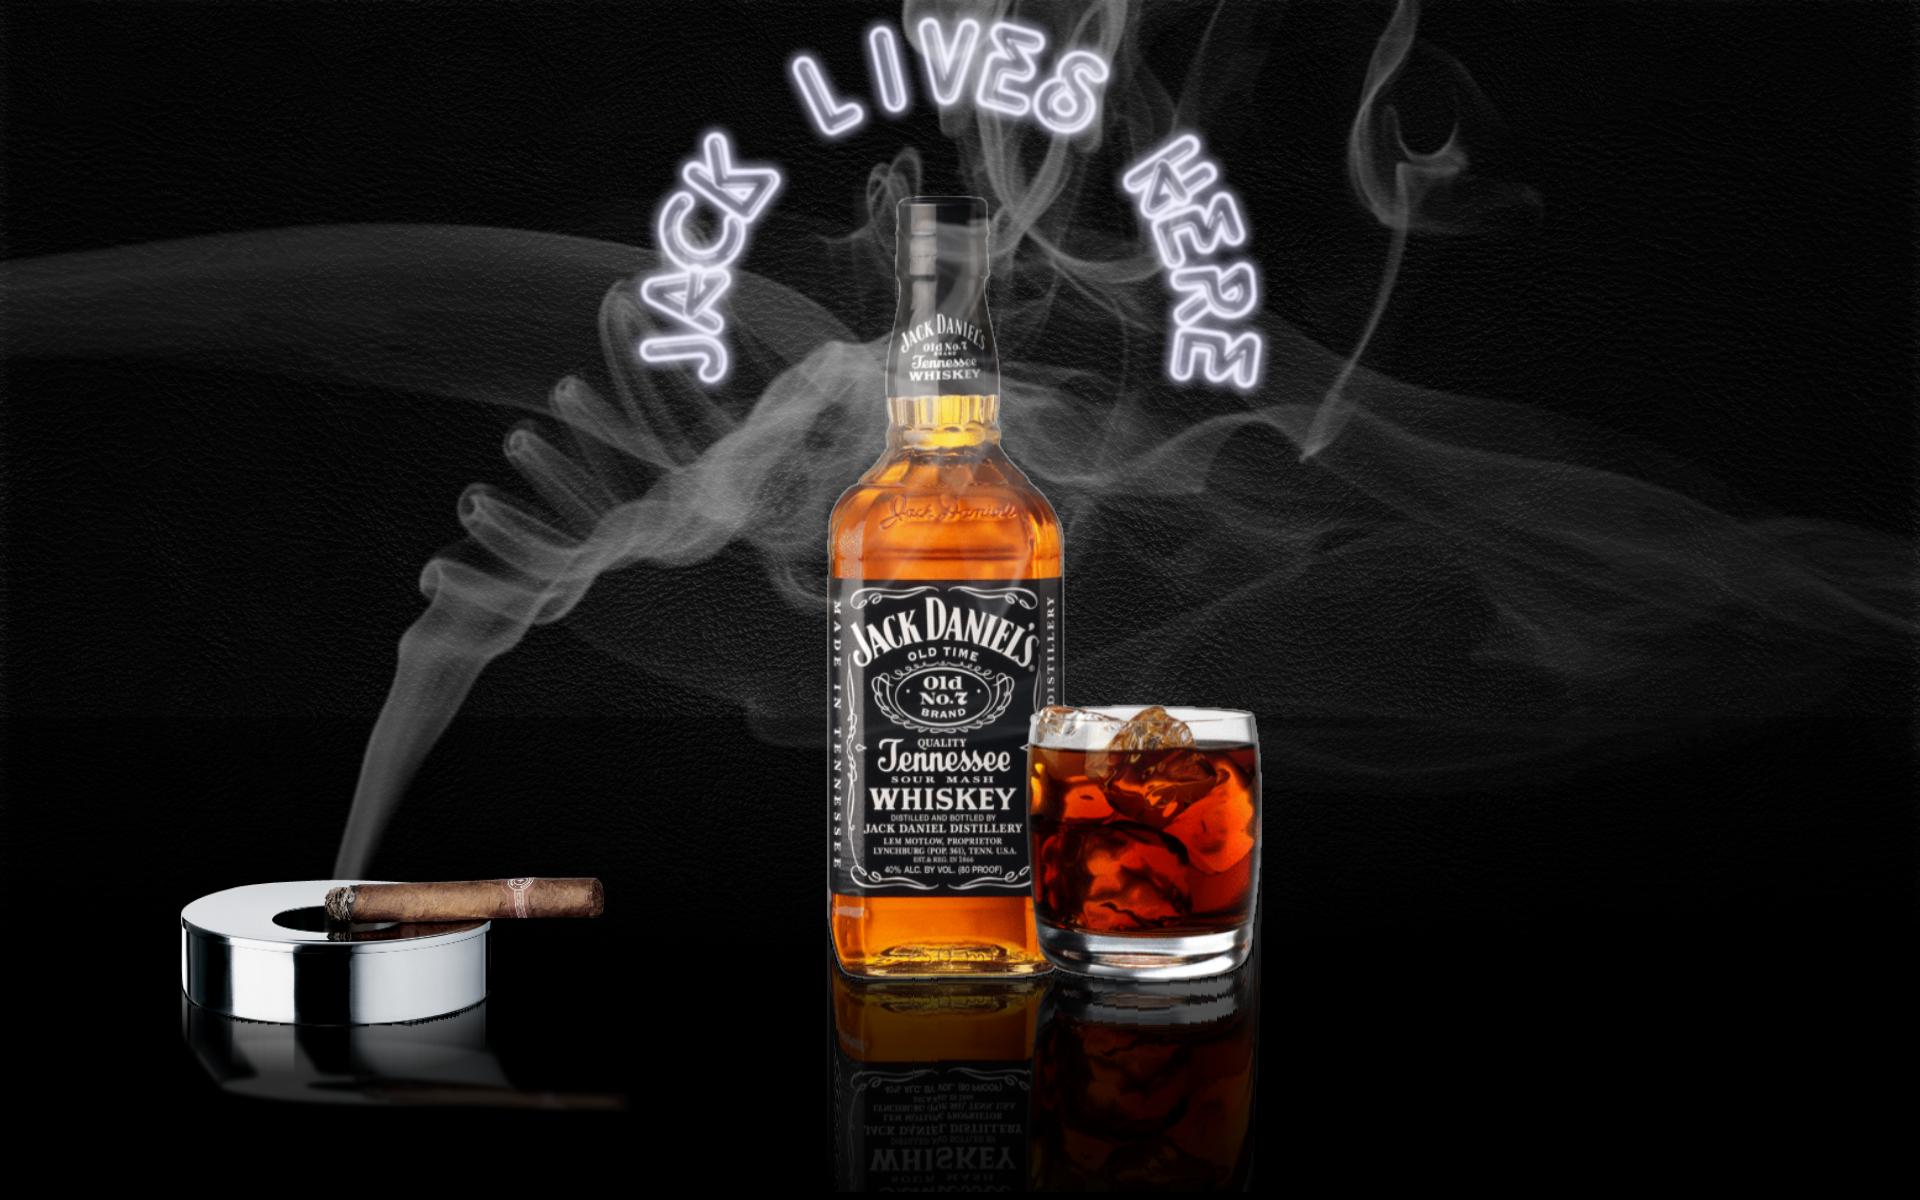 Jack Daniels And Cigarette HD Wallpaper Image For PC Desktop